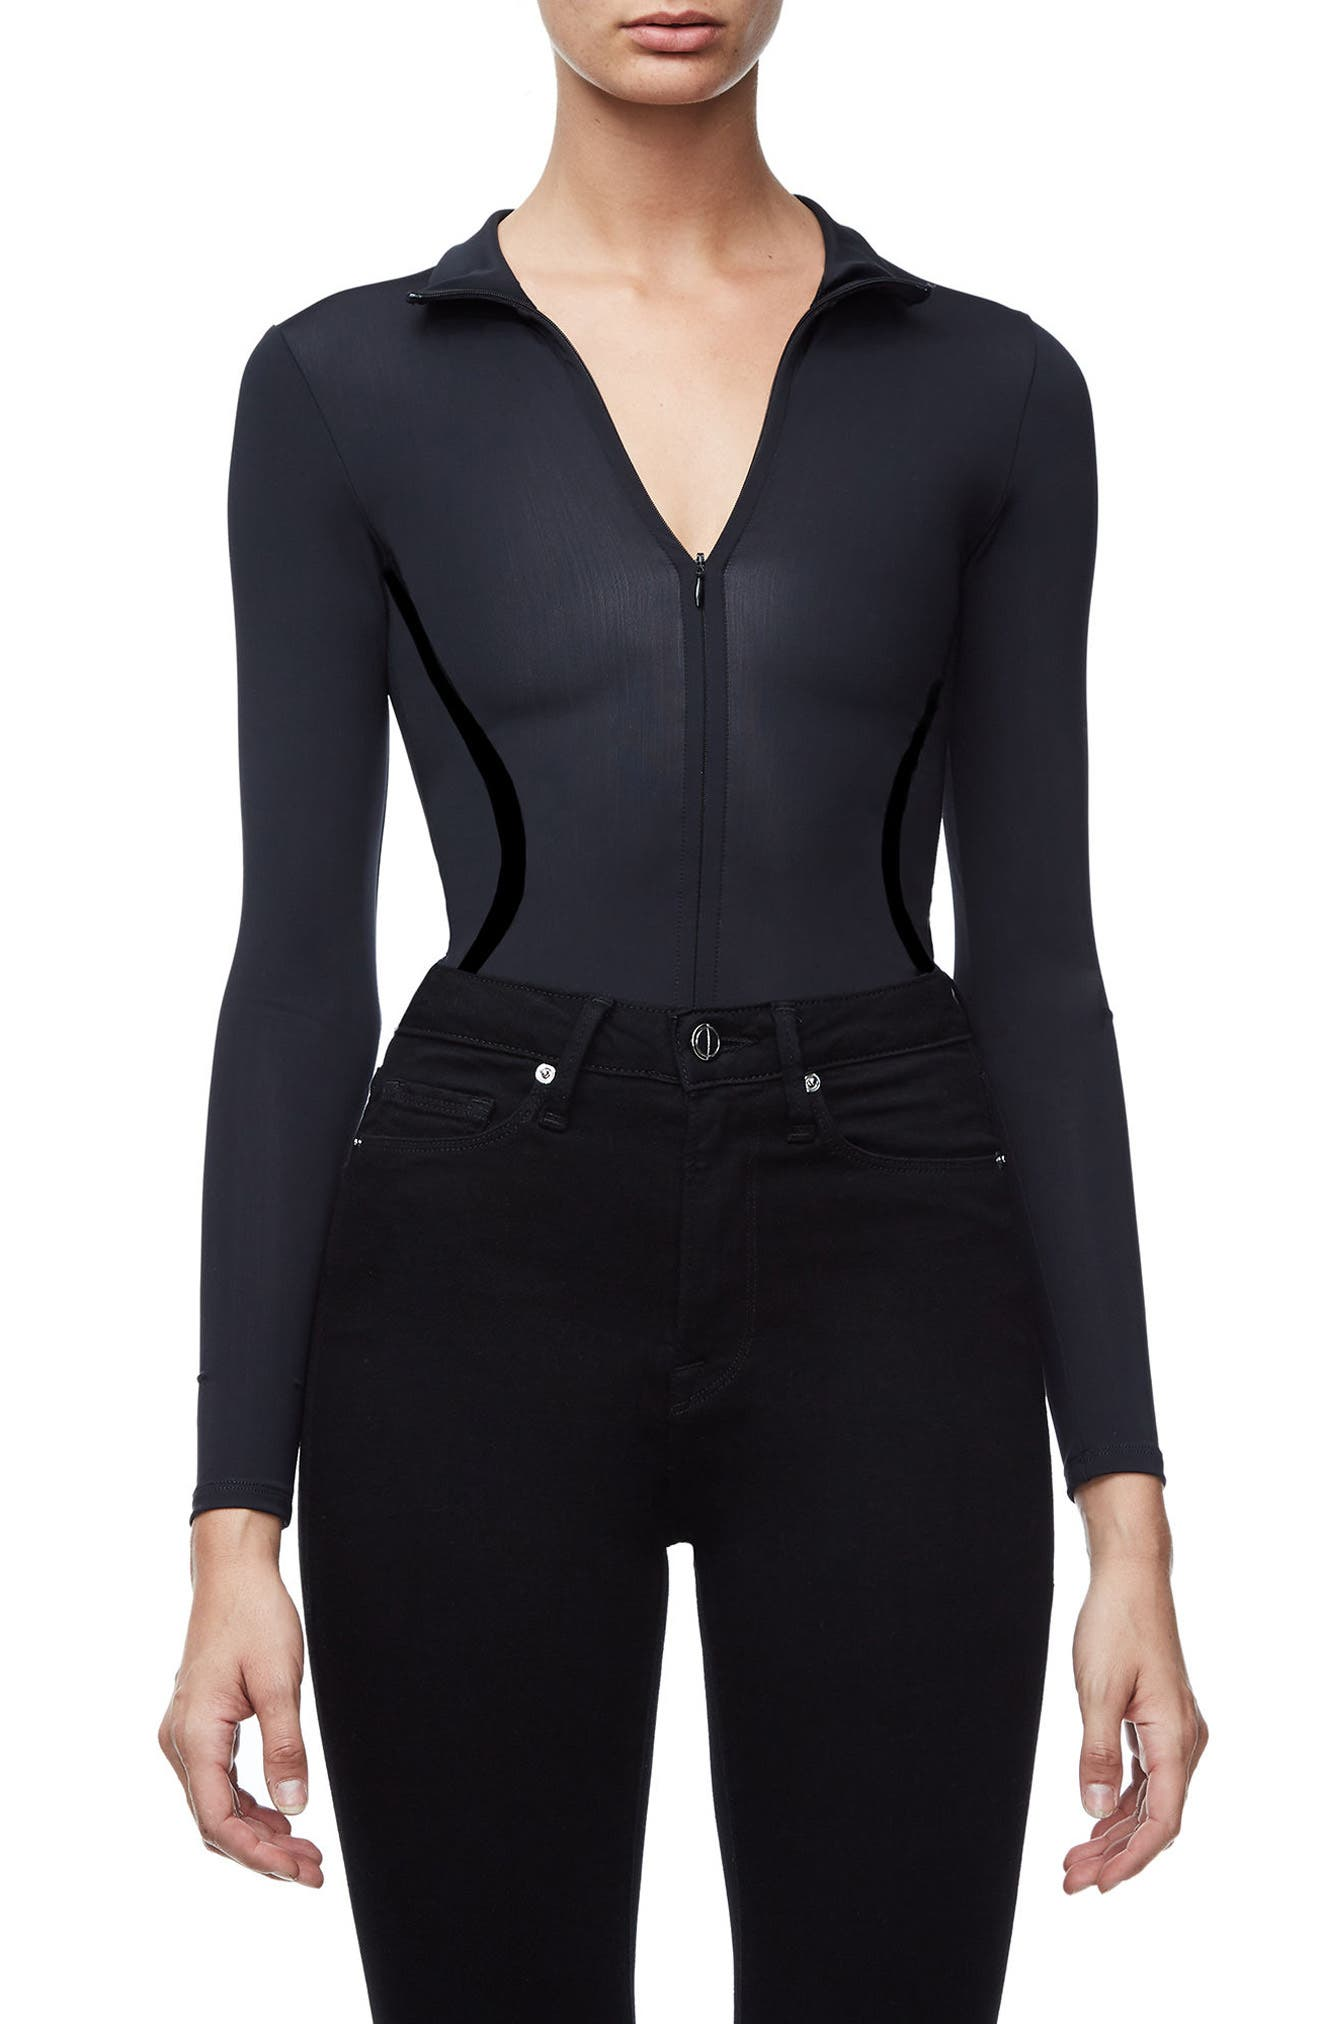 Alternate Image 1 Selected - Good American The Slightly Scuba Thong Bodysuit (Regular & Plus Size)